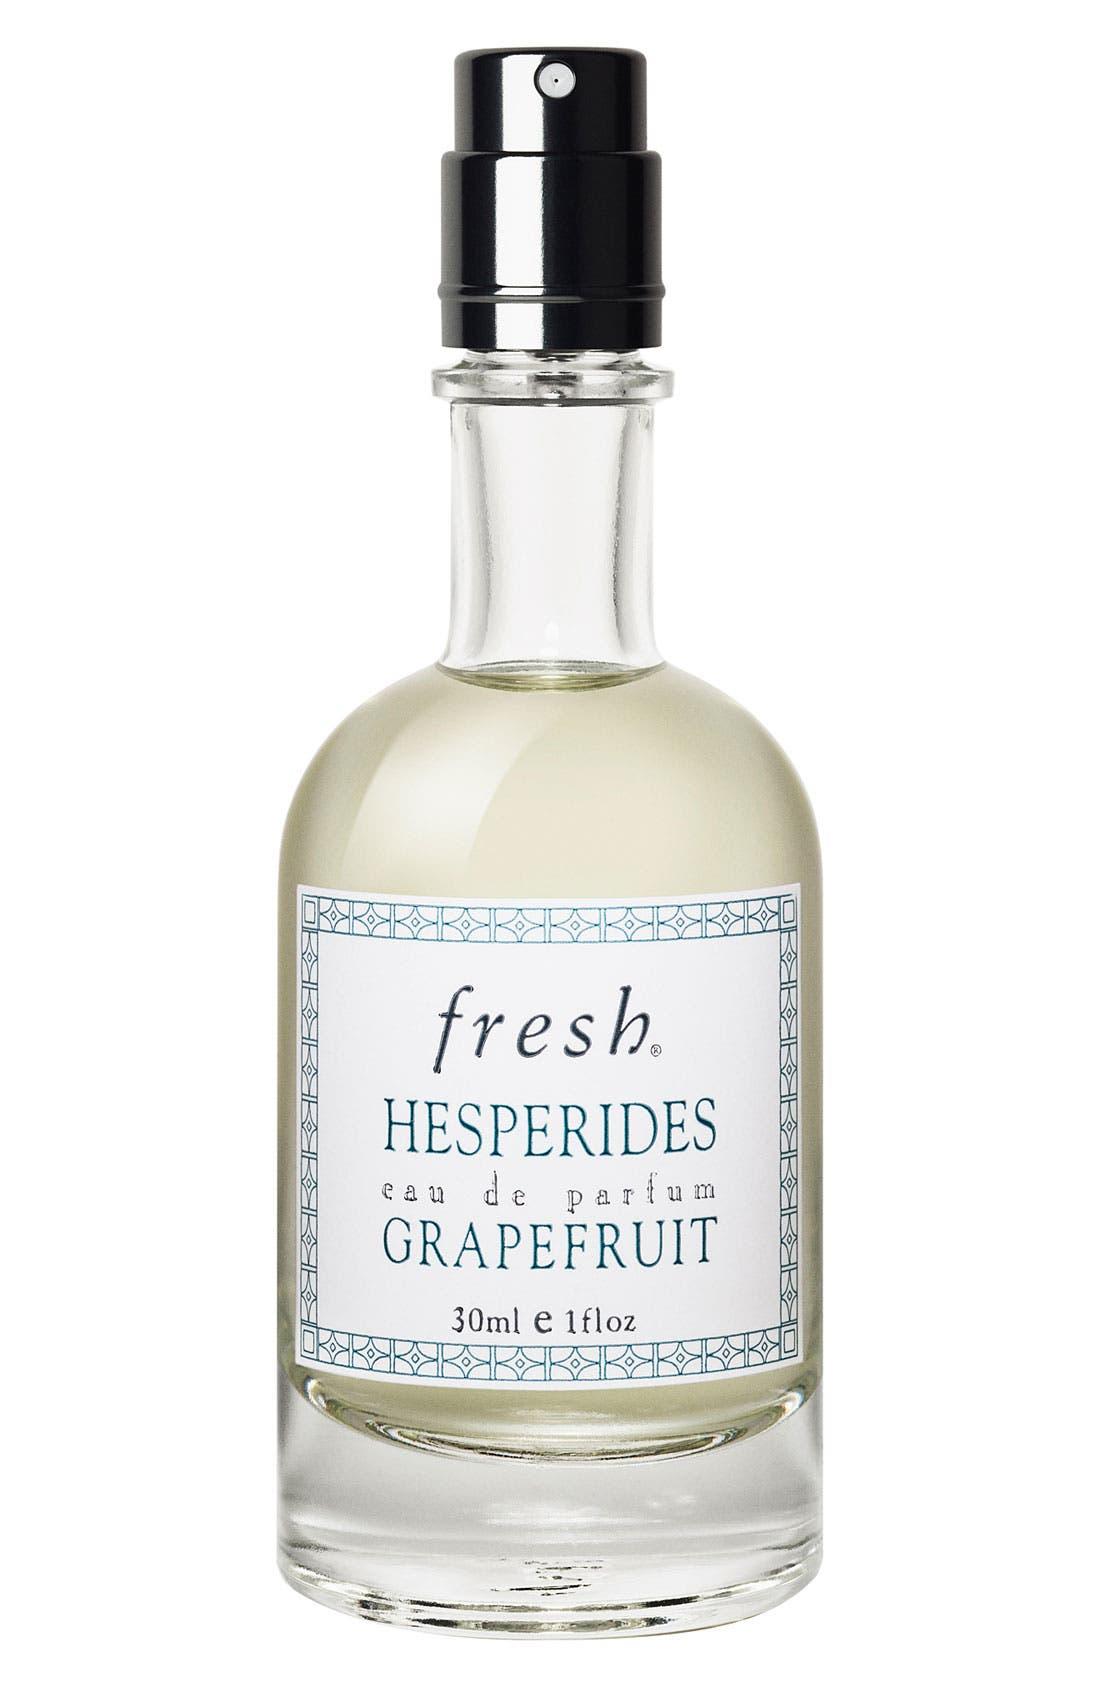 Fresh® Hesperides Grapefruit Eau de Parfum